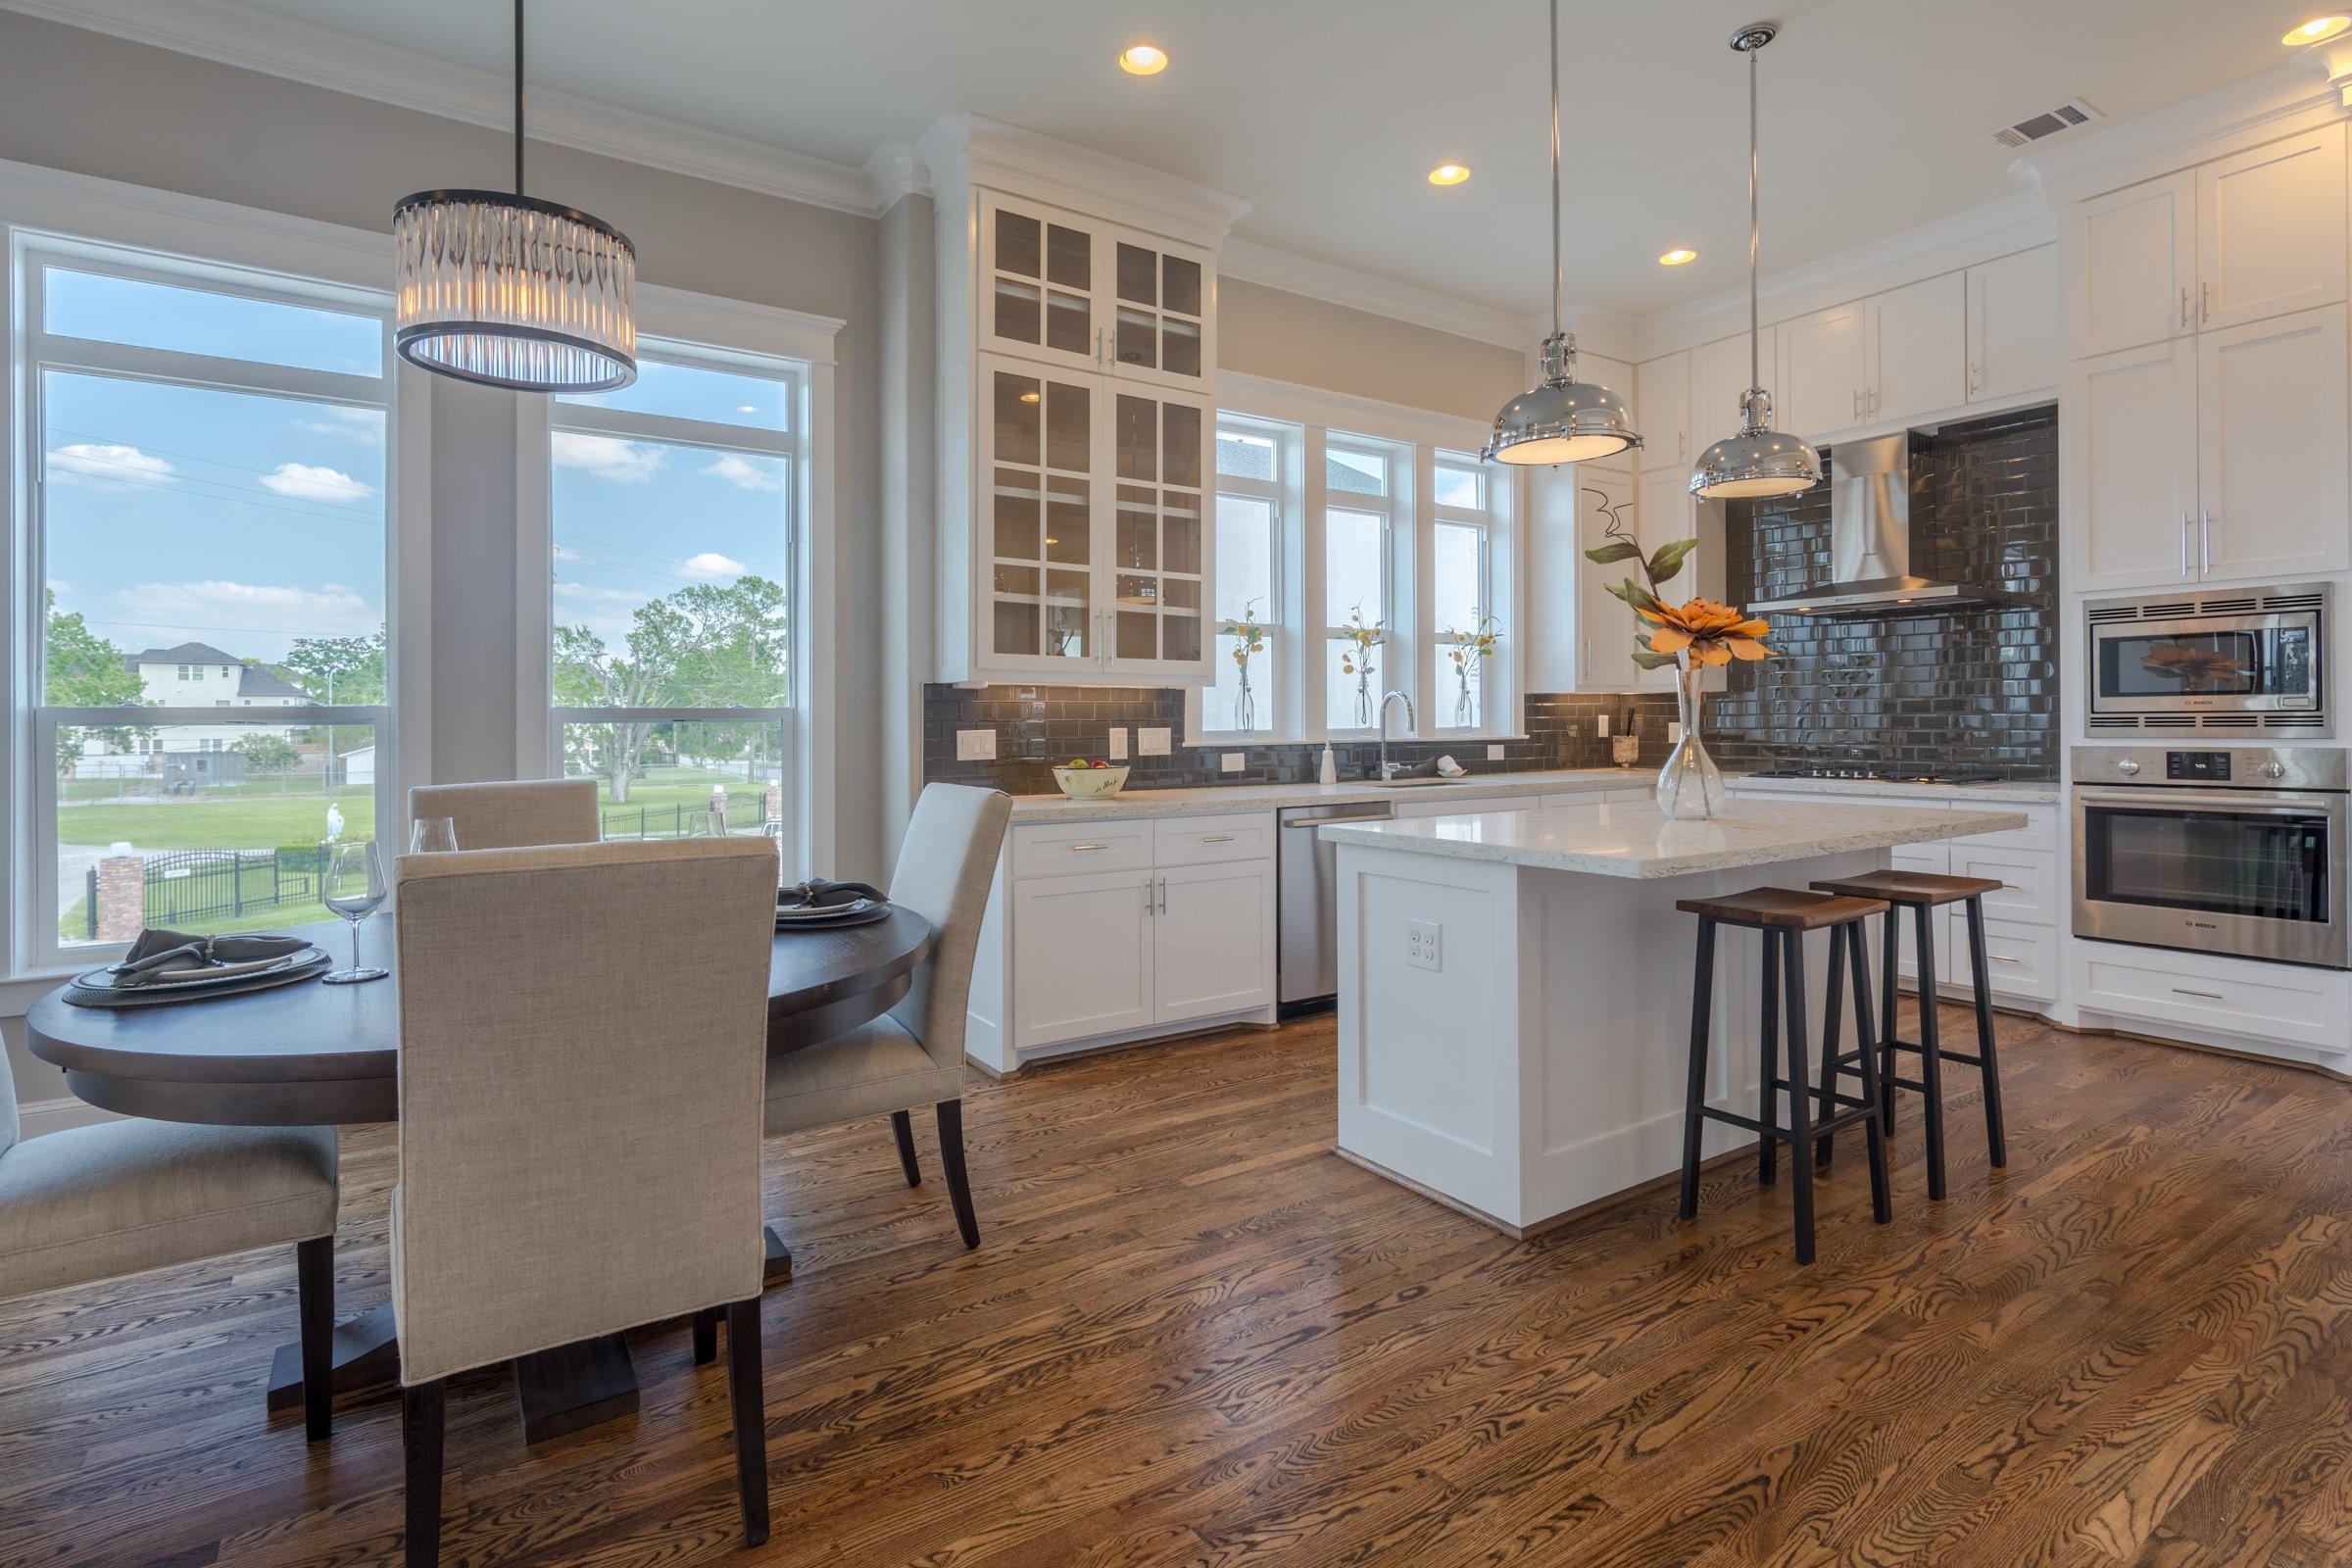 blessings hardwood flooring clifton nj of listings search homesmart fine properties intended for 012 014 37422353